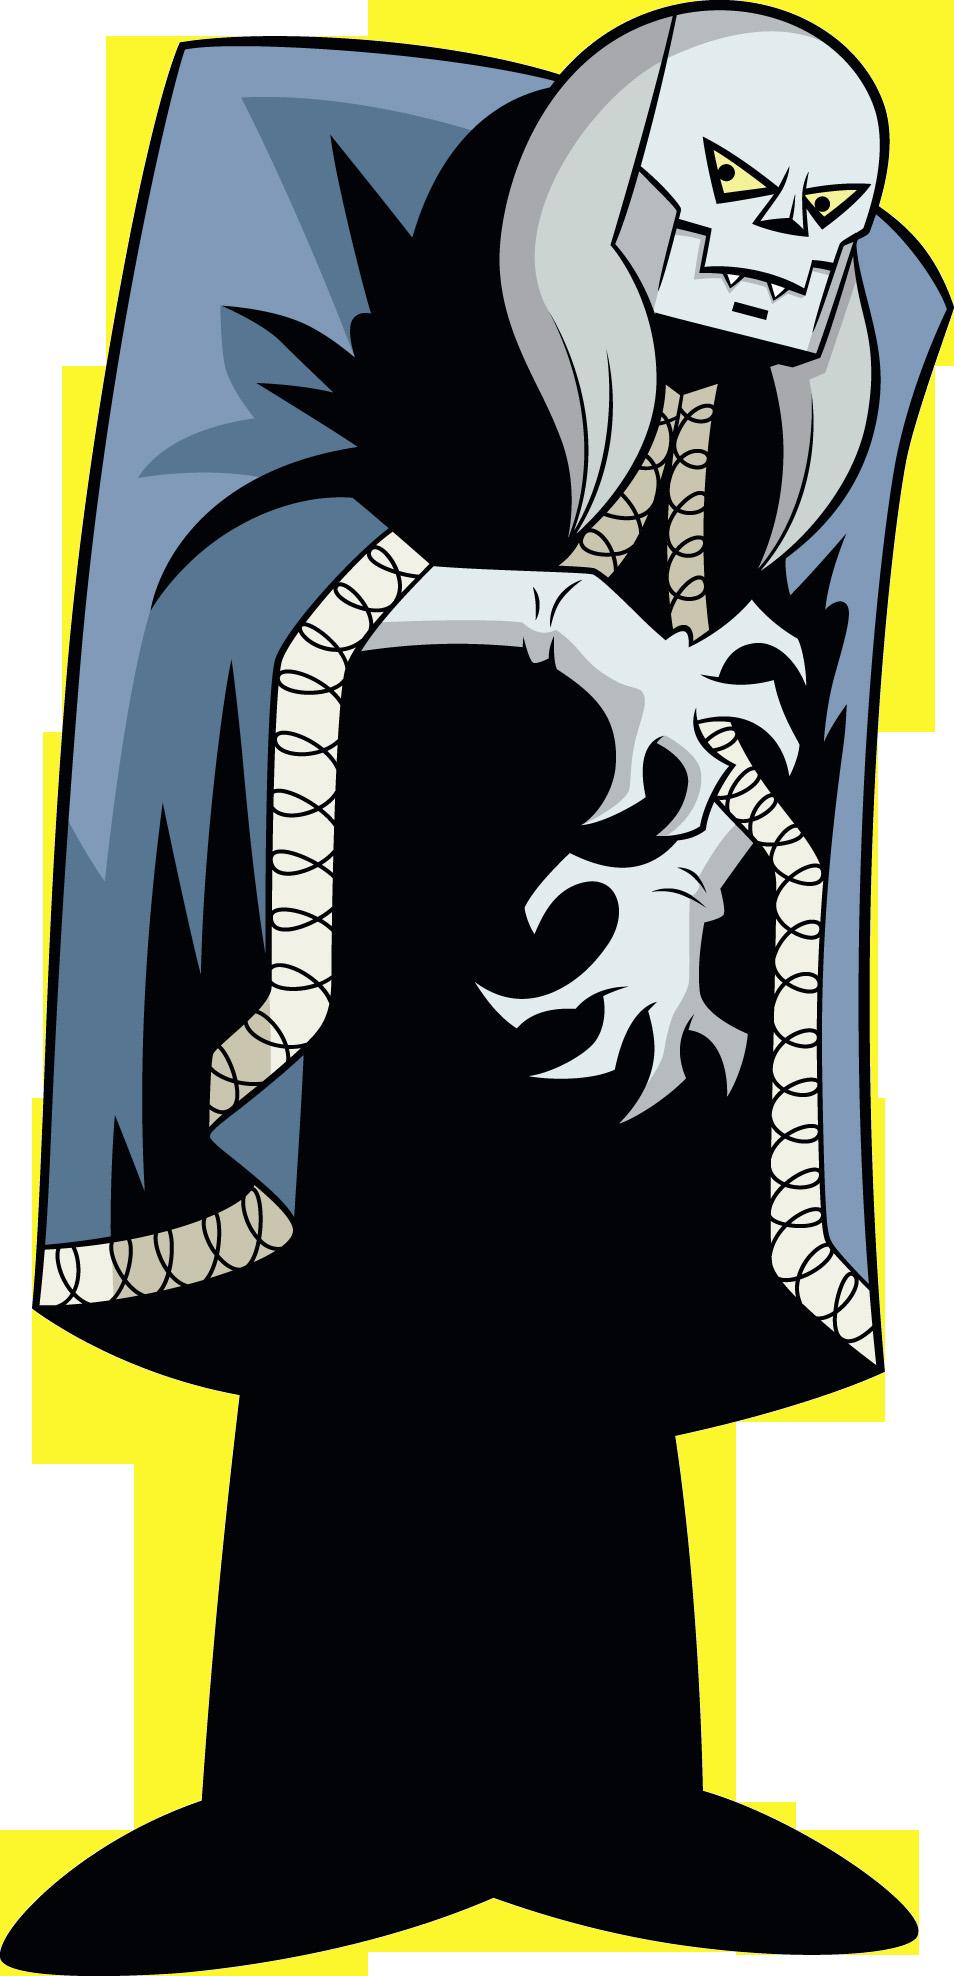 V.V. Argost